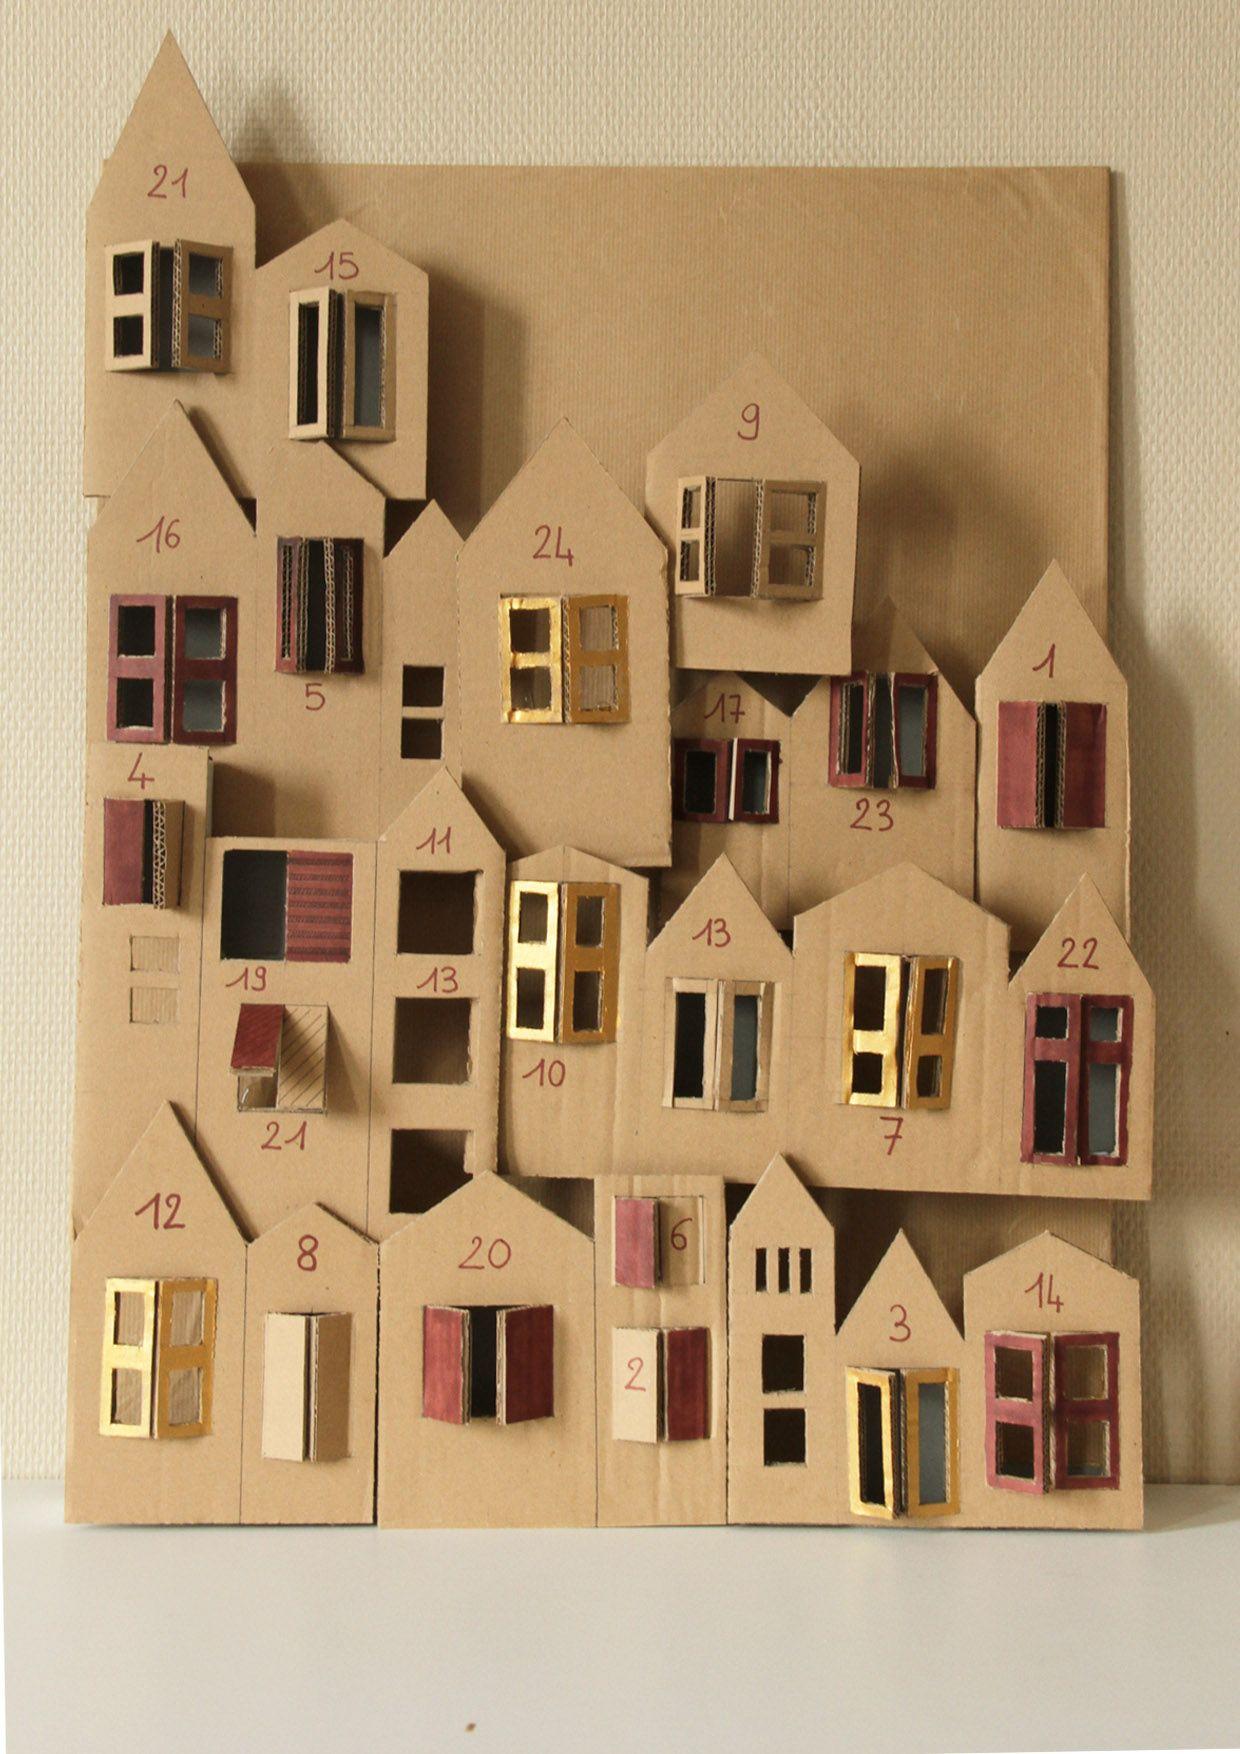 Pinterest Calendrier Avent #15: Advent Calendar SMALL TOWN / Calendrier De Lu0027avent Ville De Carton